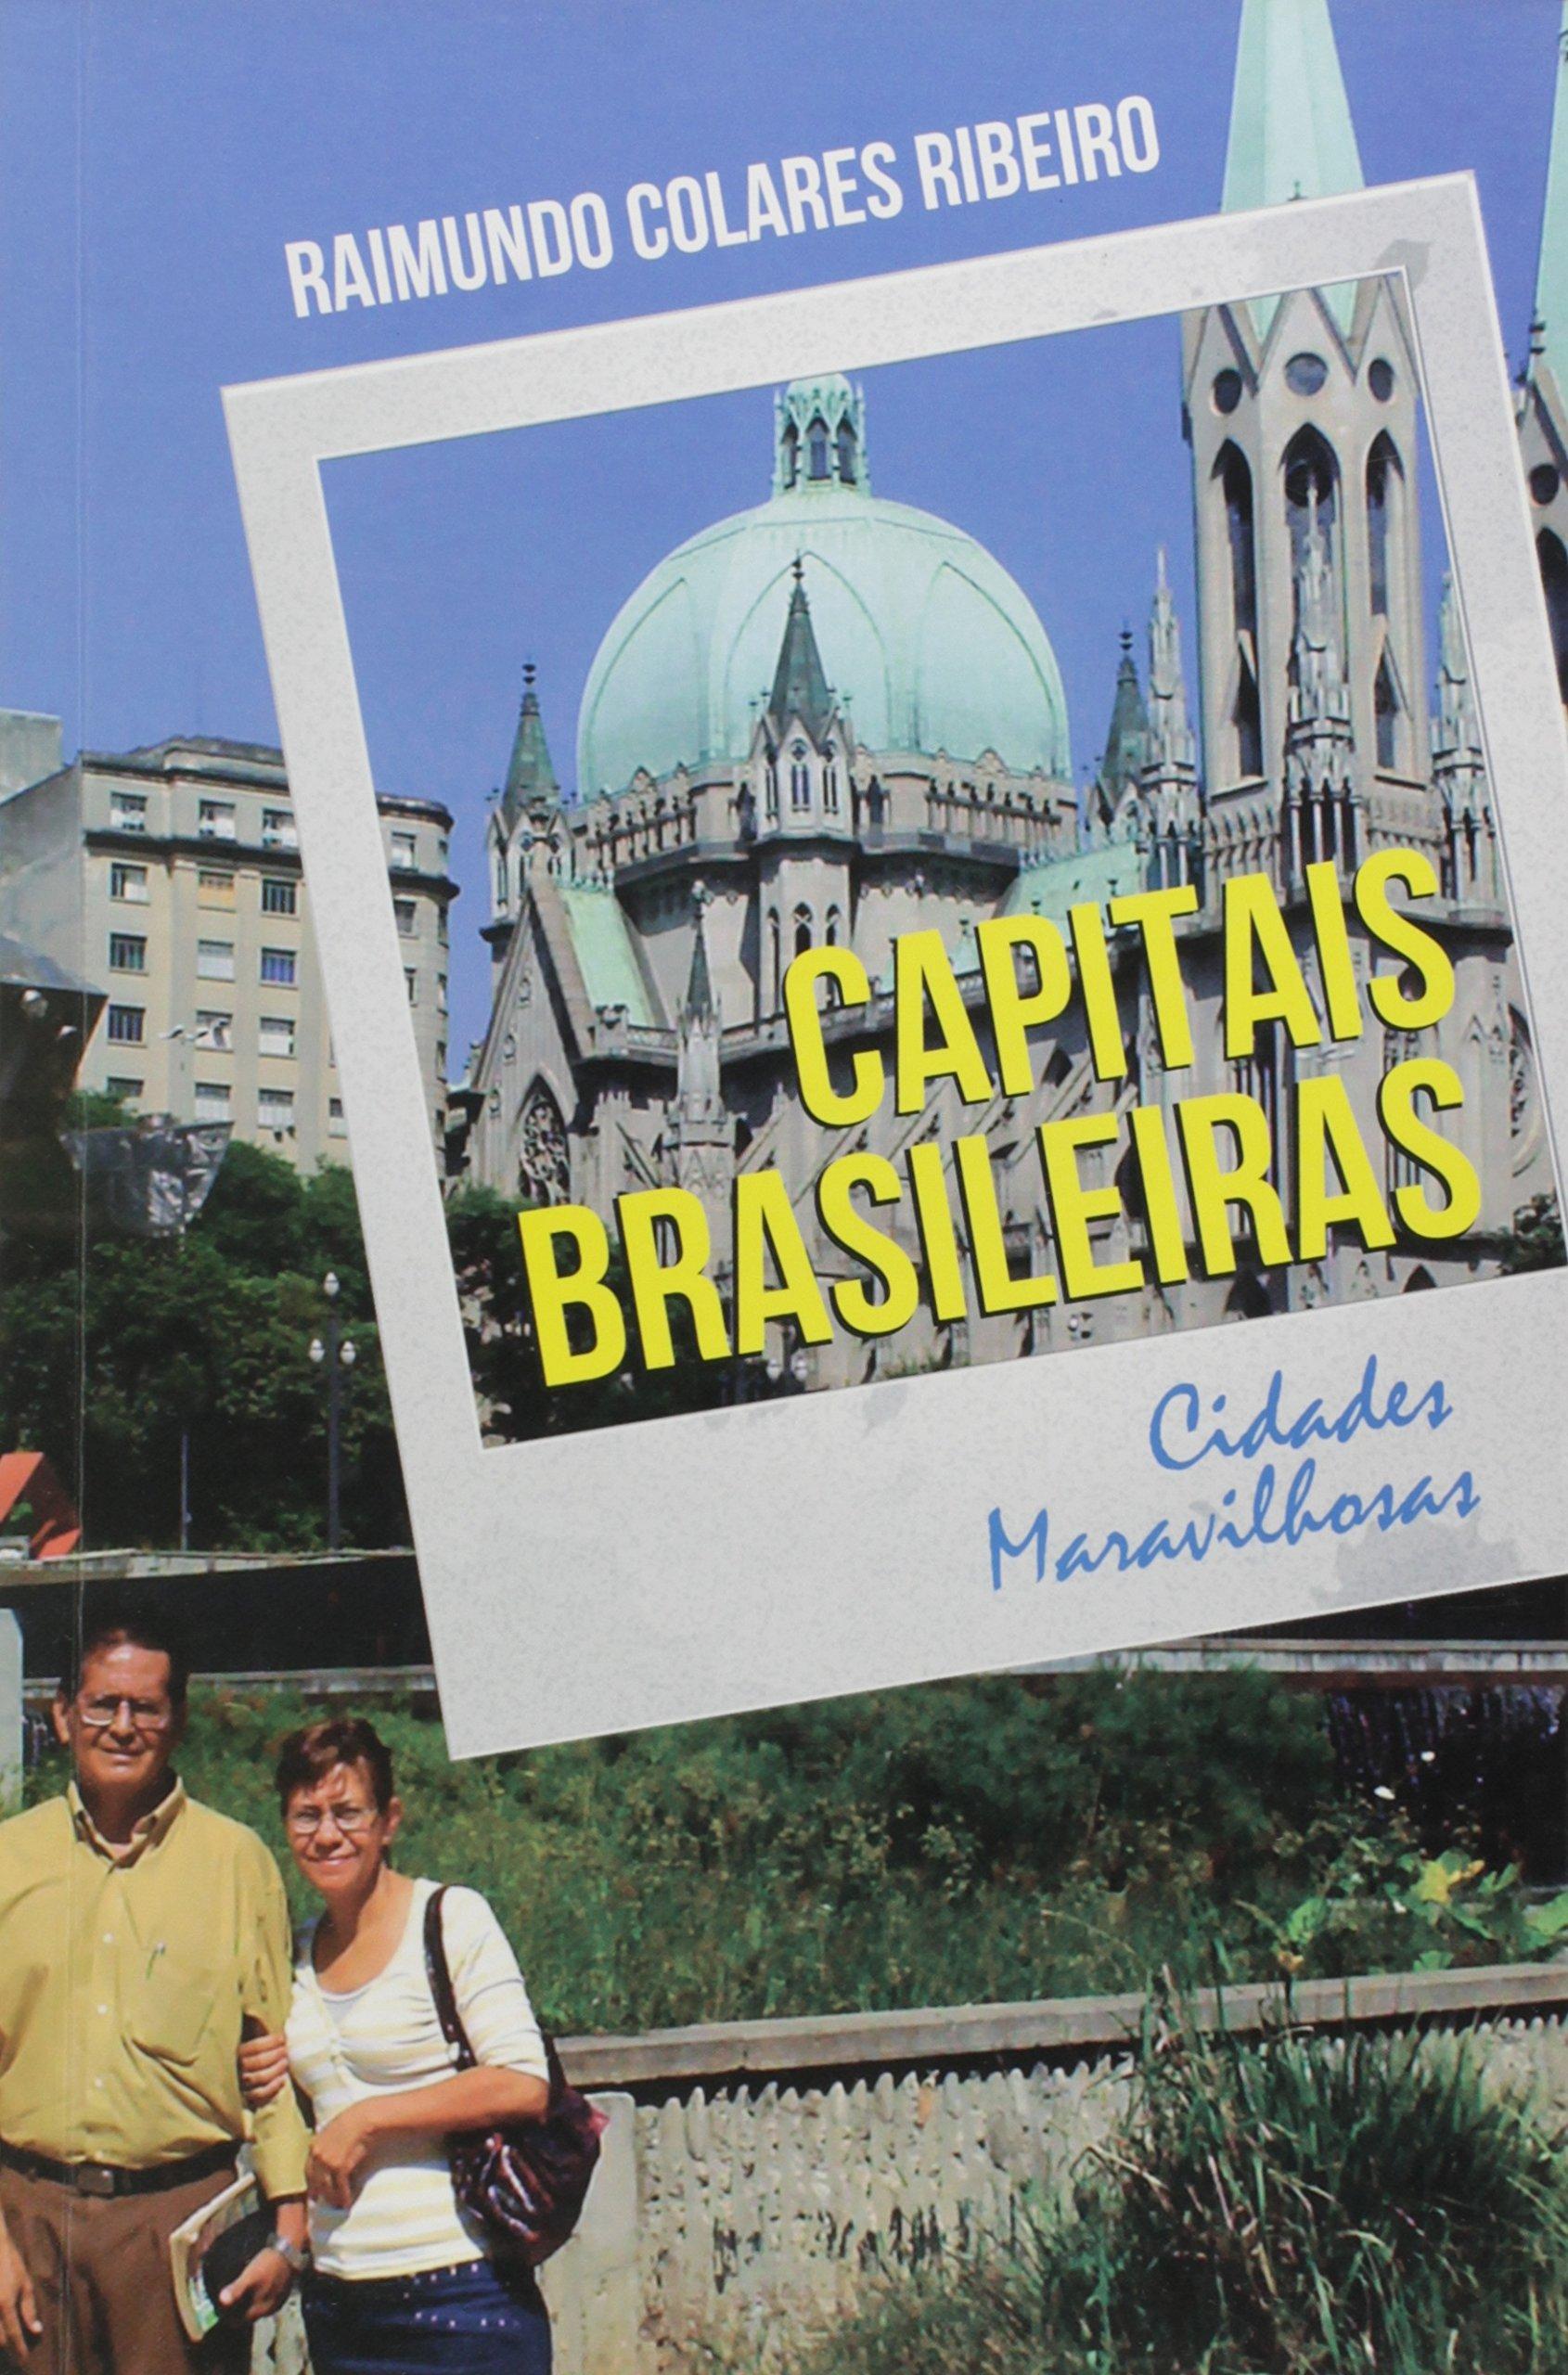 Download Capitais Brasileiras: Cidades Maravilhosas ebook